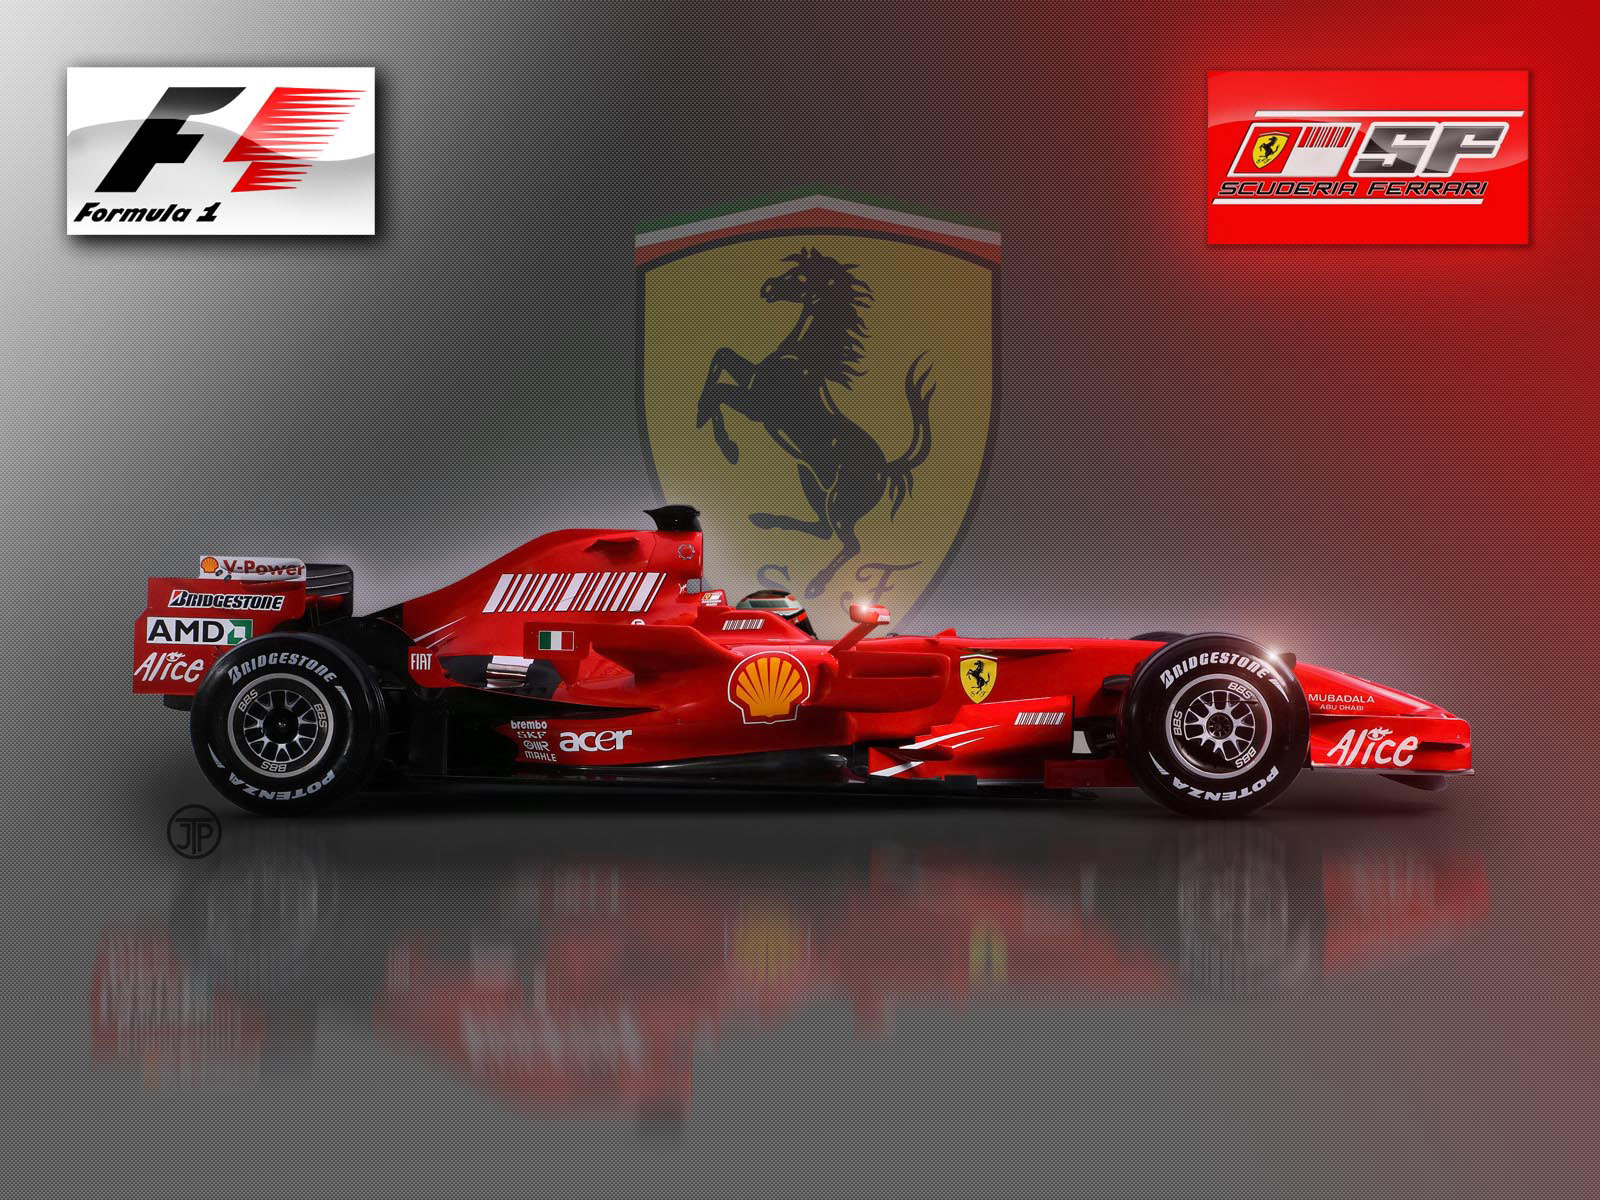 http://2.bp.blogspot.com/_ba0eJBJ85vA/S_JWocwobYI/AAAAAAAAApI/-U08CUc5XpU/s1600/FerrariF1Wallpaper3.jpg